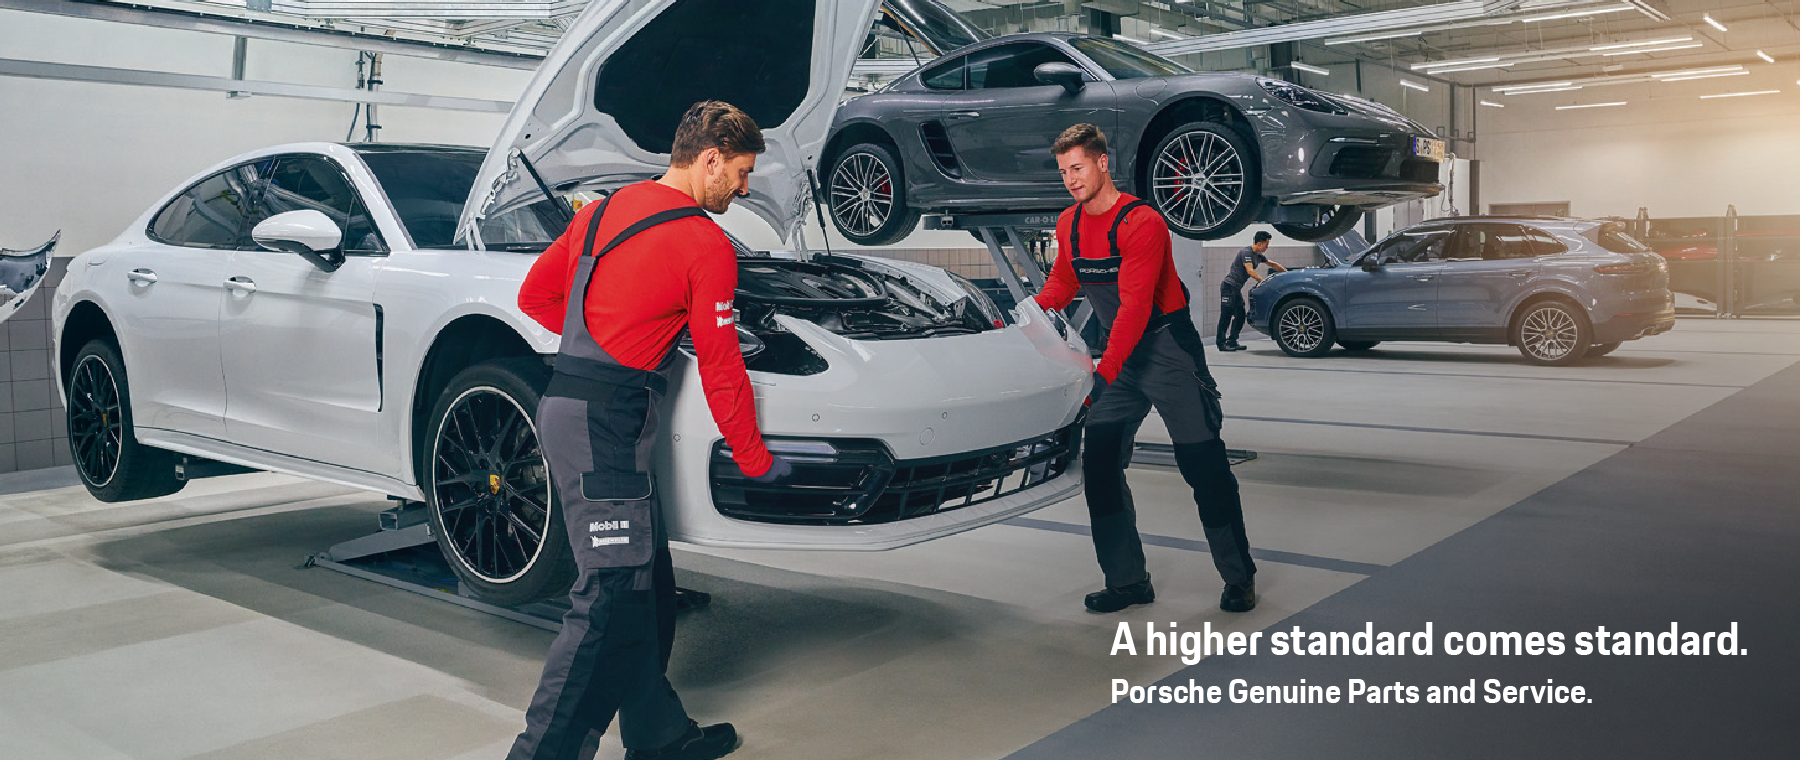 Porsche Genuine Parts and Service